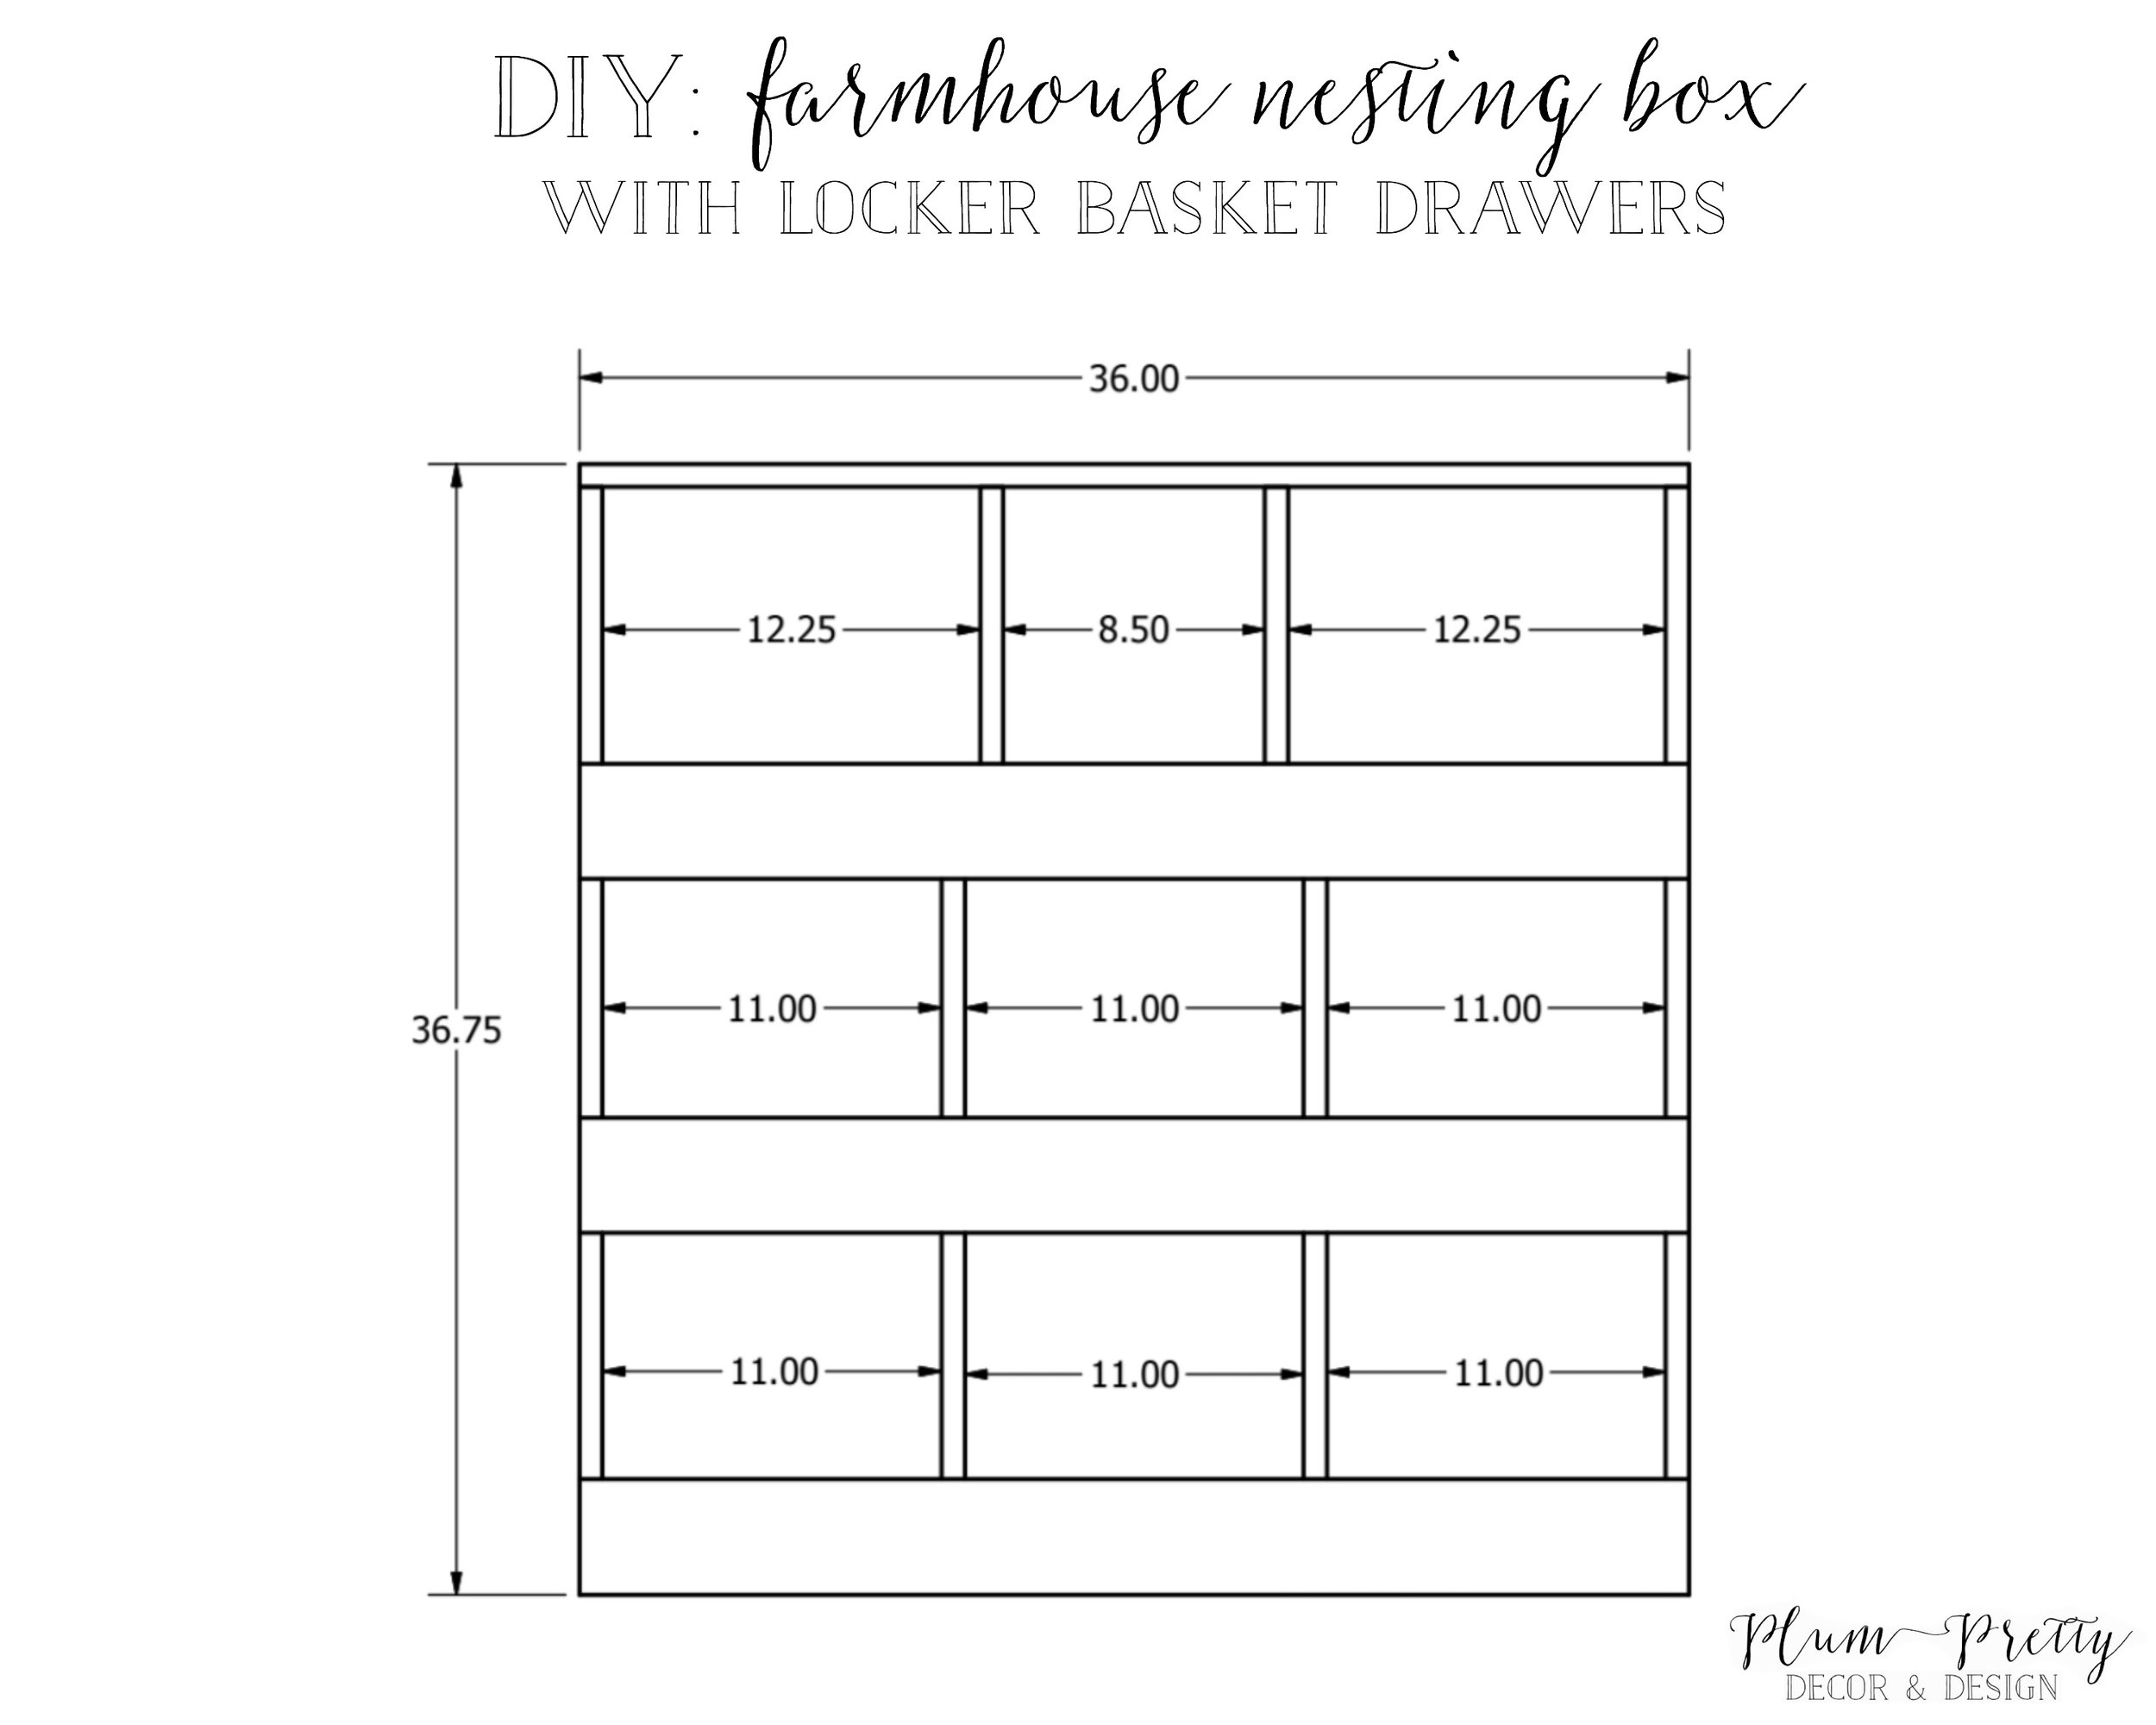 DIY: Farmhouse Nesting Box with Locker Basket Drawers Tutorial by Plum Pretty Decor and Design